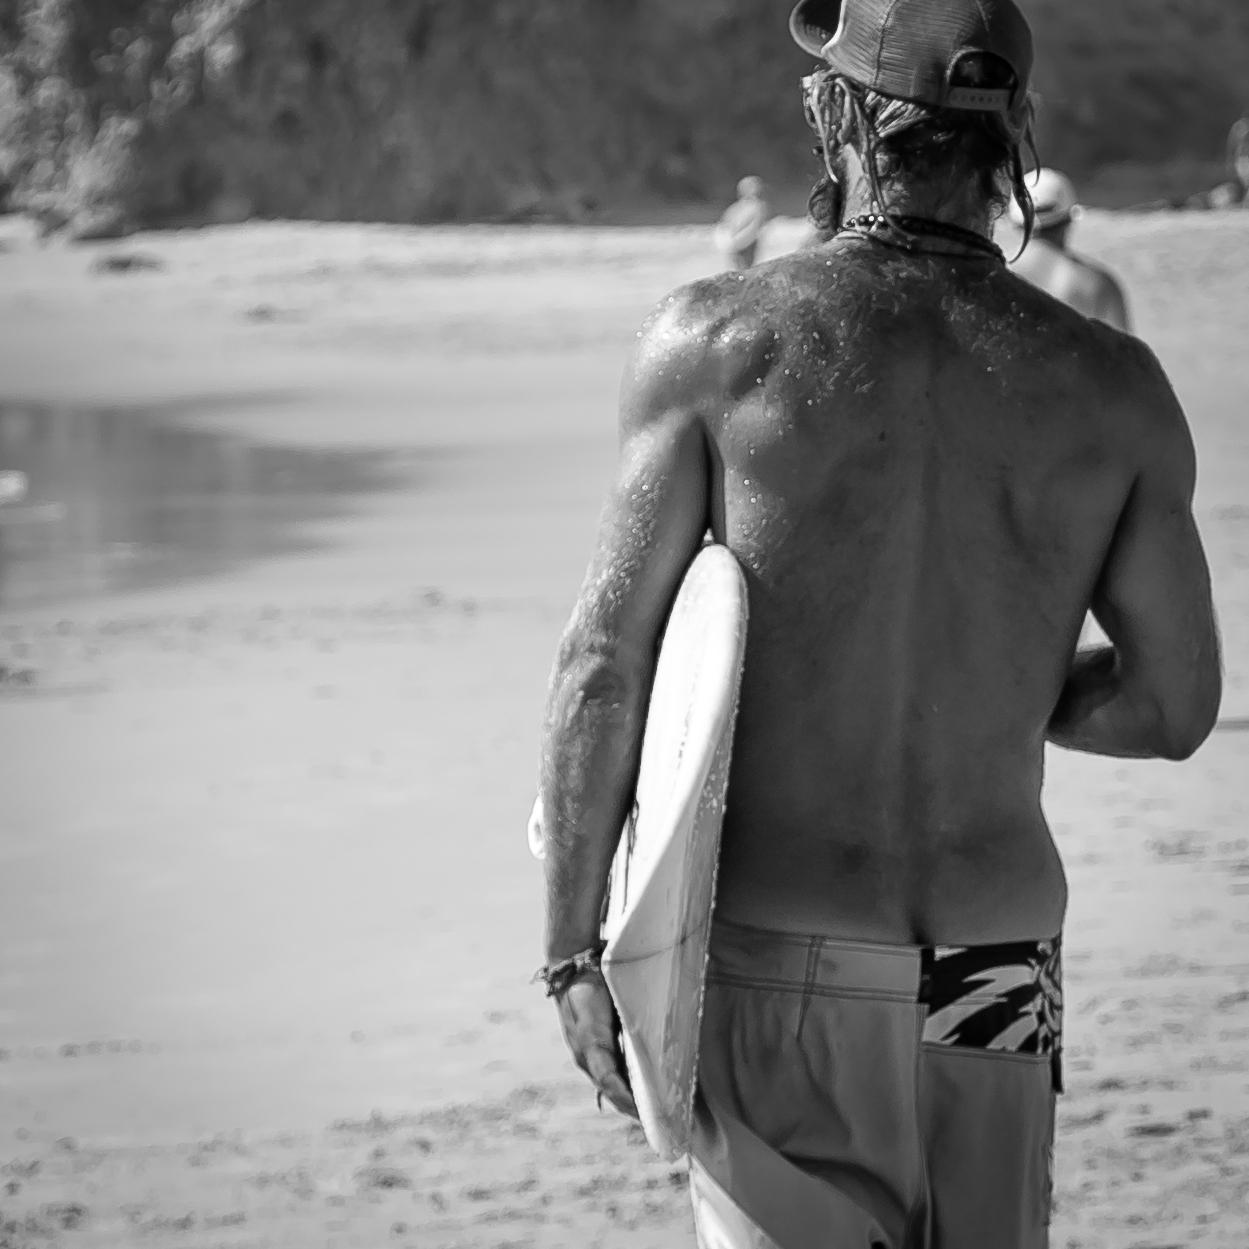 9 Surf bum